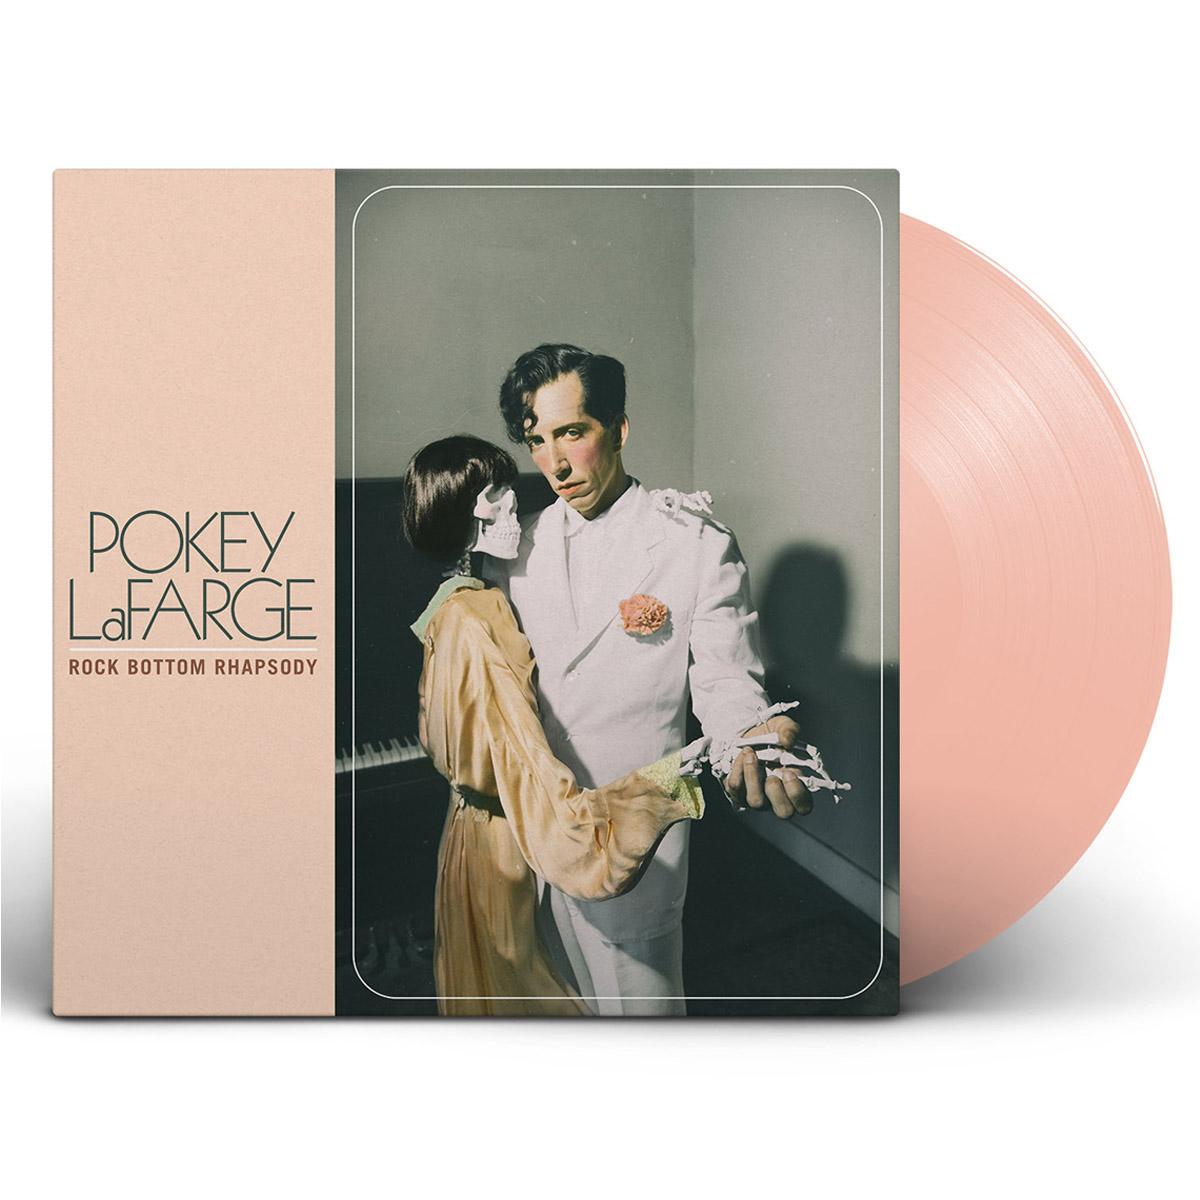 Rock Bottom Rhapsody - Ltd. Edition Pink Opaque Vinyl